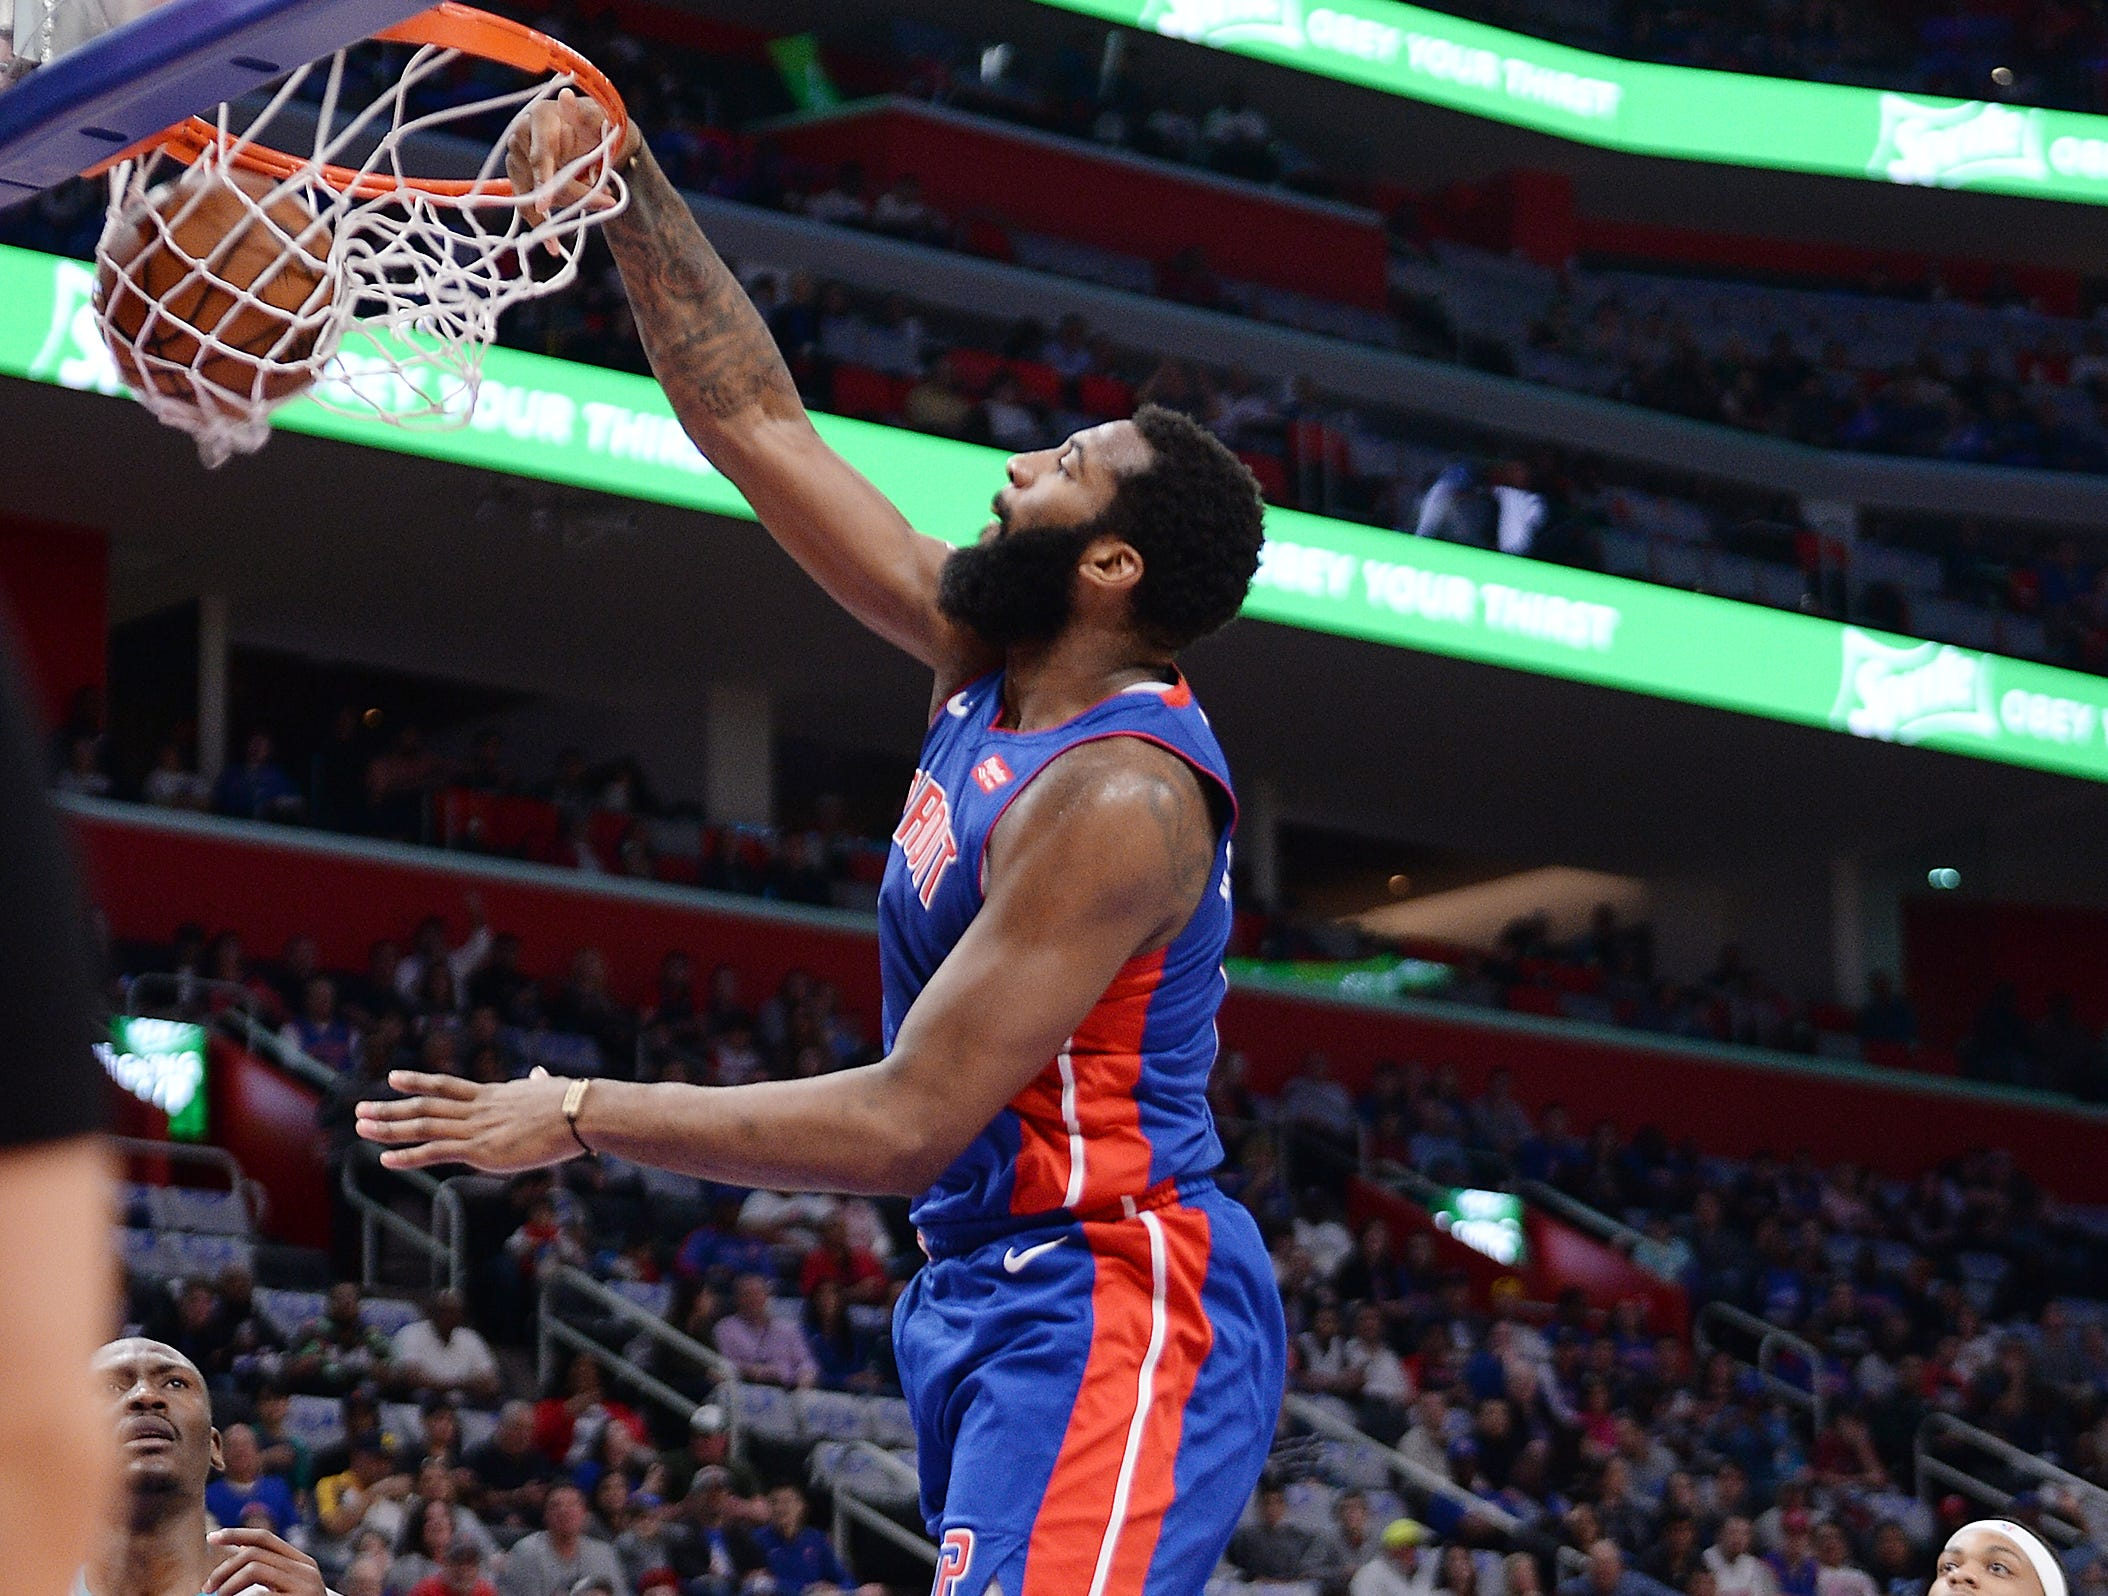 Pistons' Andre Drummond dunks over Hornets' Bismack Biyombo in the first quarter.